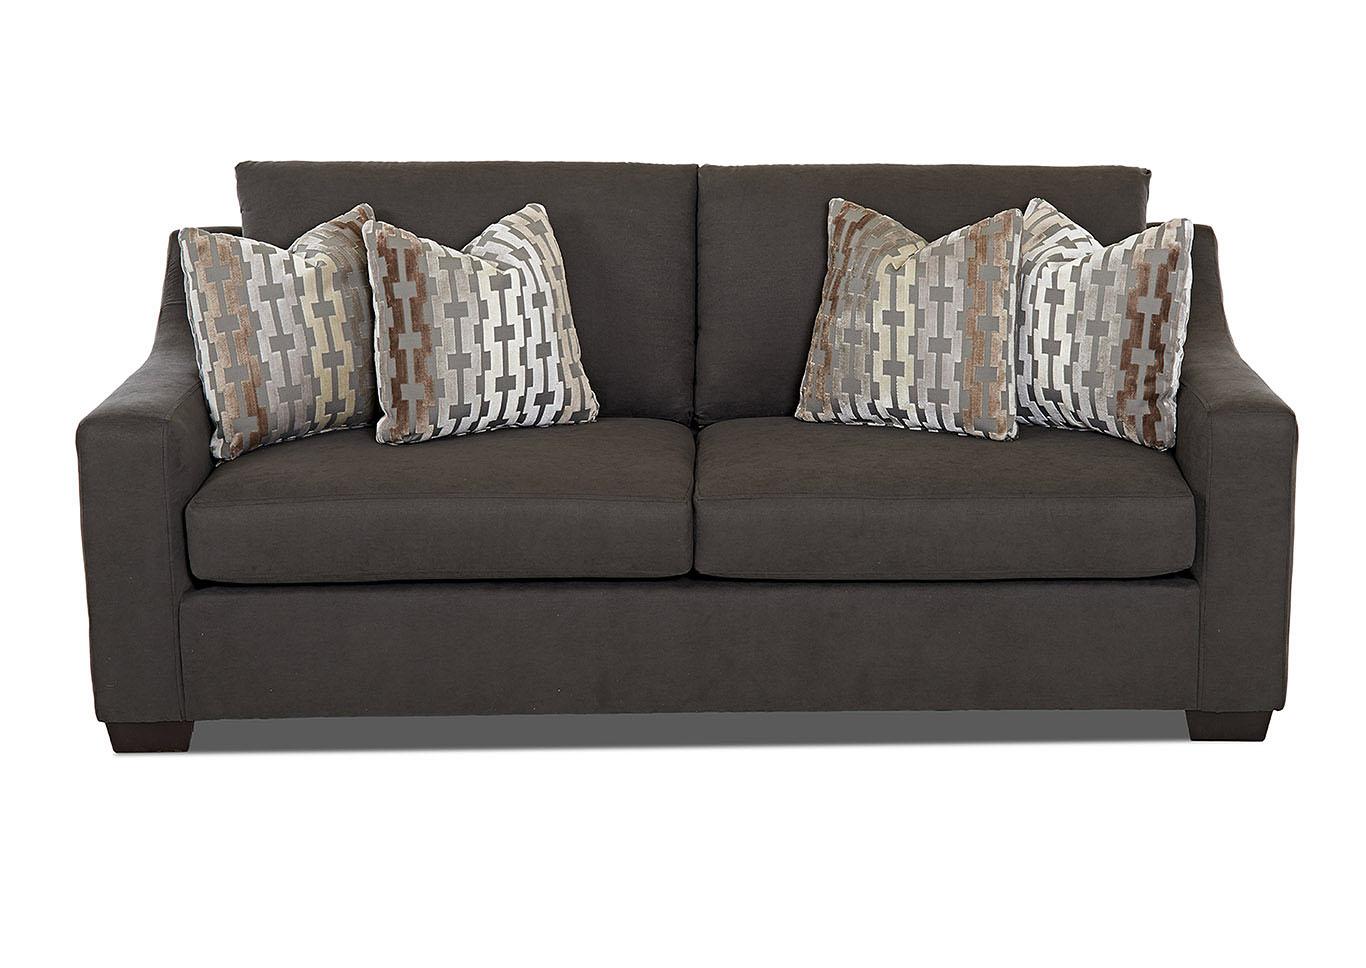 Compass Furniture Argos Fabric Sleeper Sofa